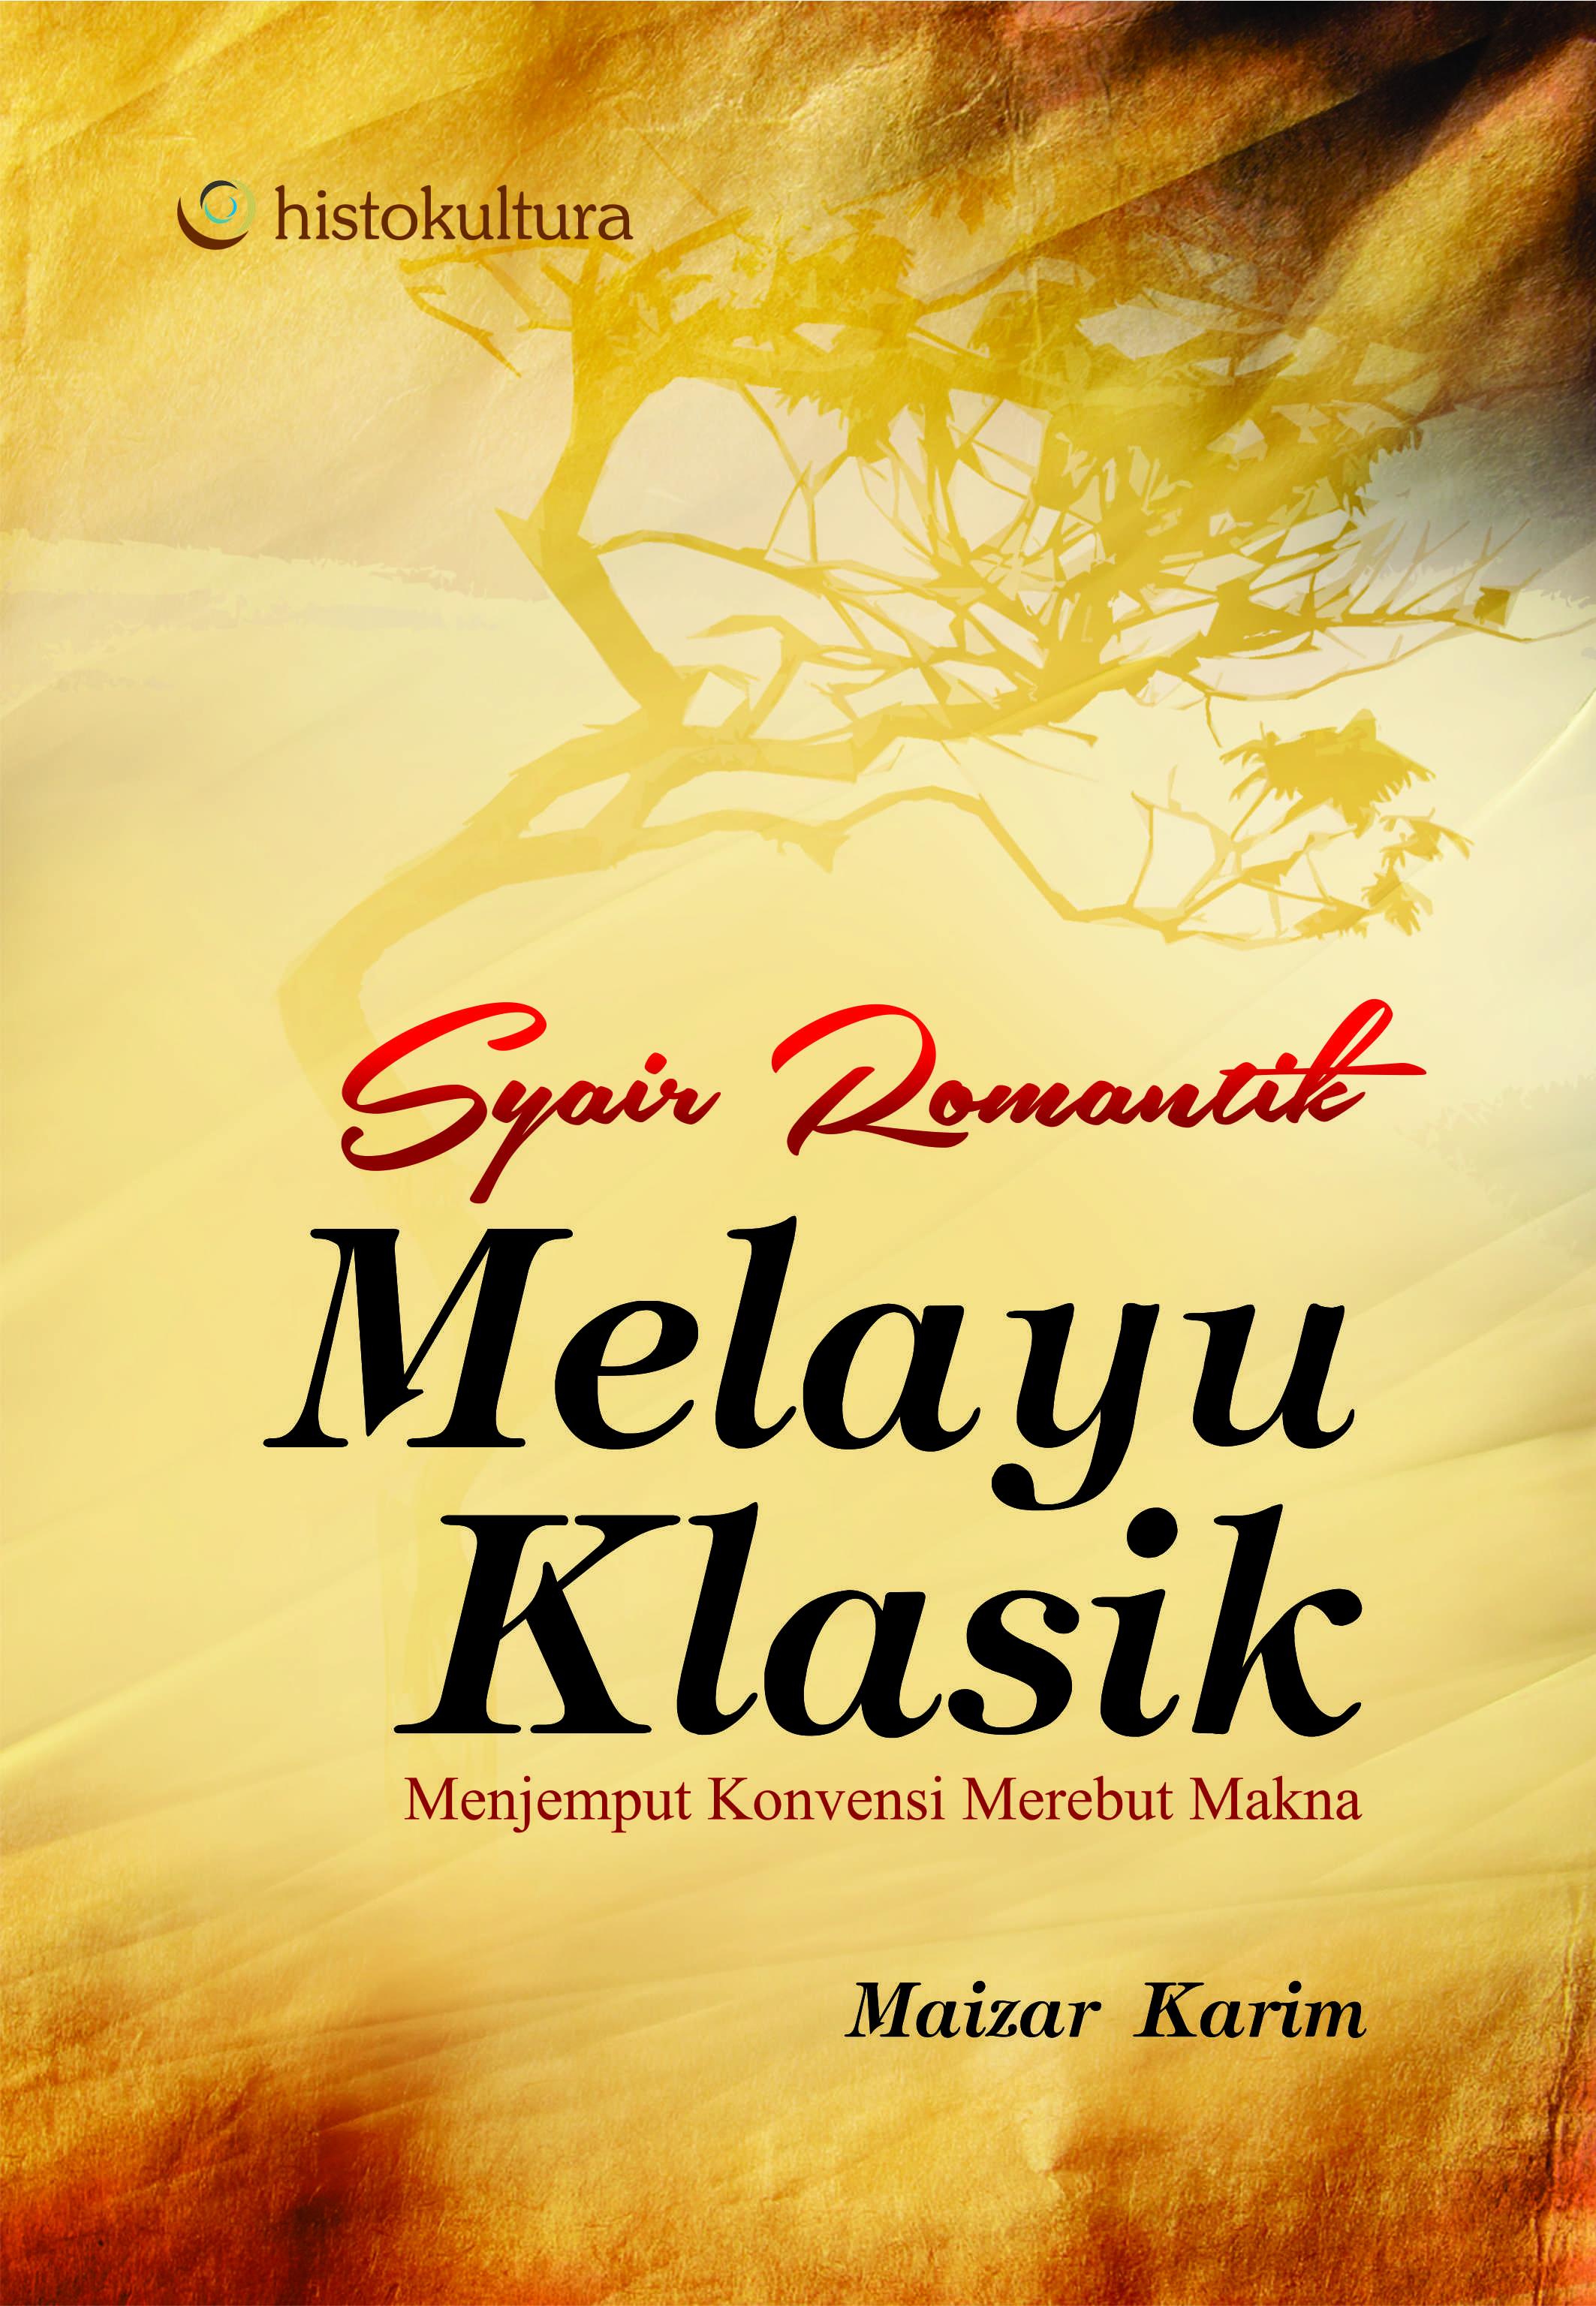 Syair Romantik Melayu Klasik; Menjemput Konvensi Merebut Makna